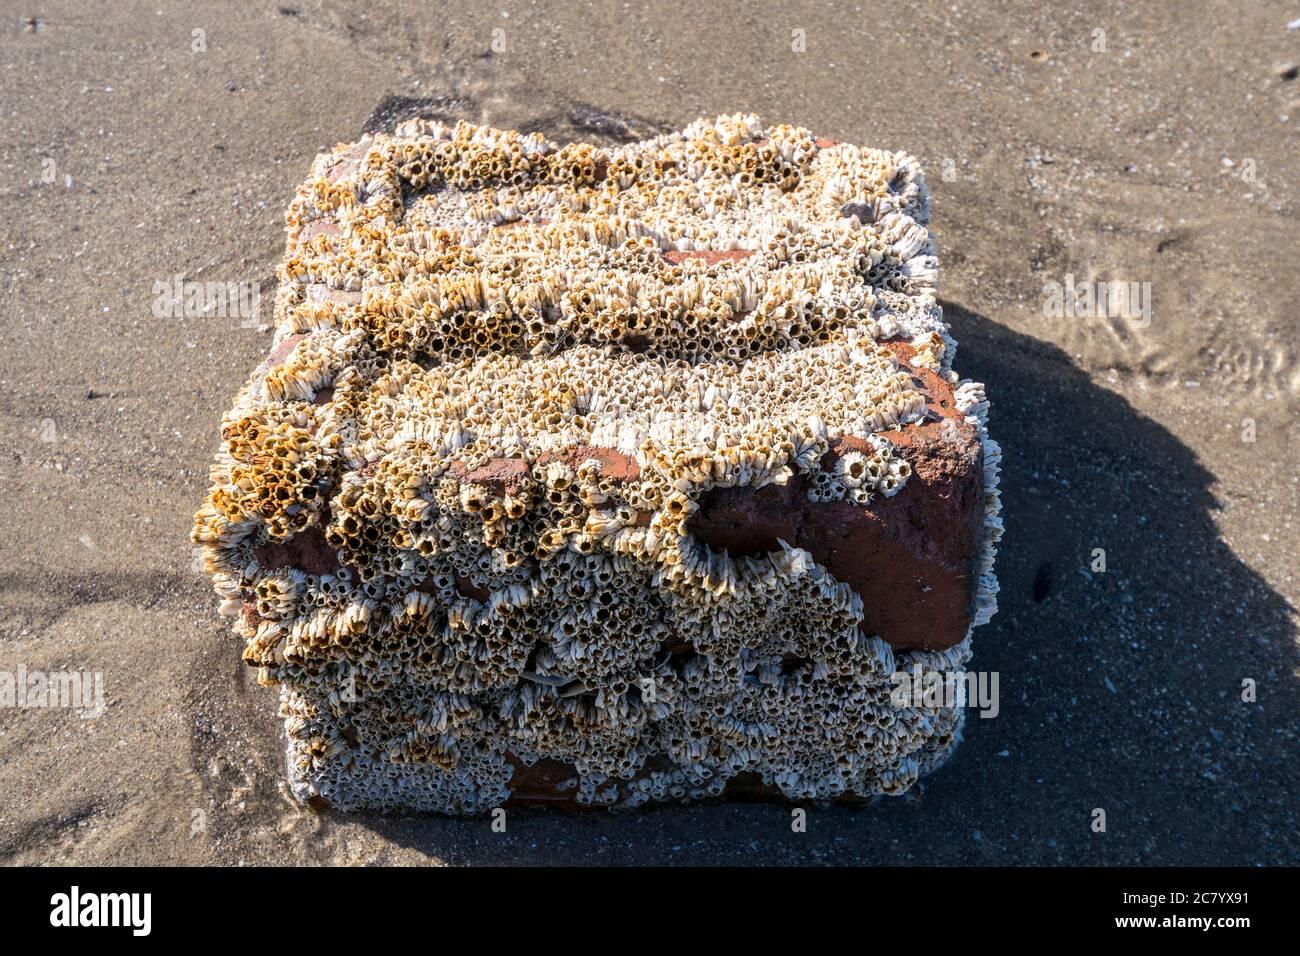 Acorn Barnacles Semi balanus balanoides o Chthamalus stellatus sobre el viejo ladrillo rojo descartado Foto de stock